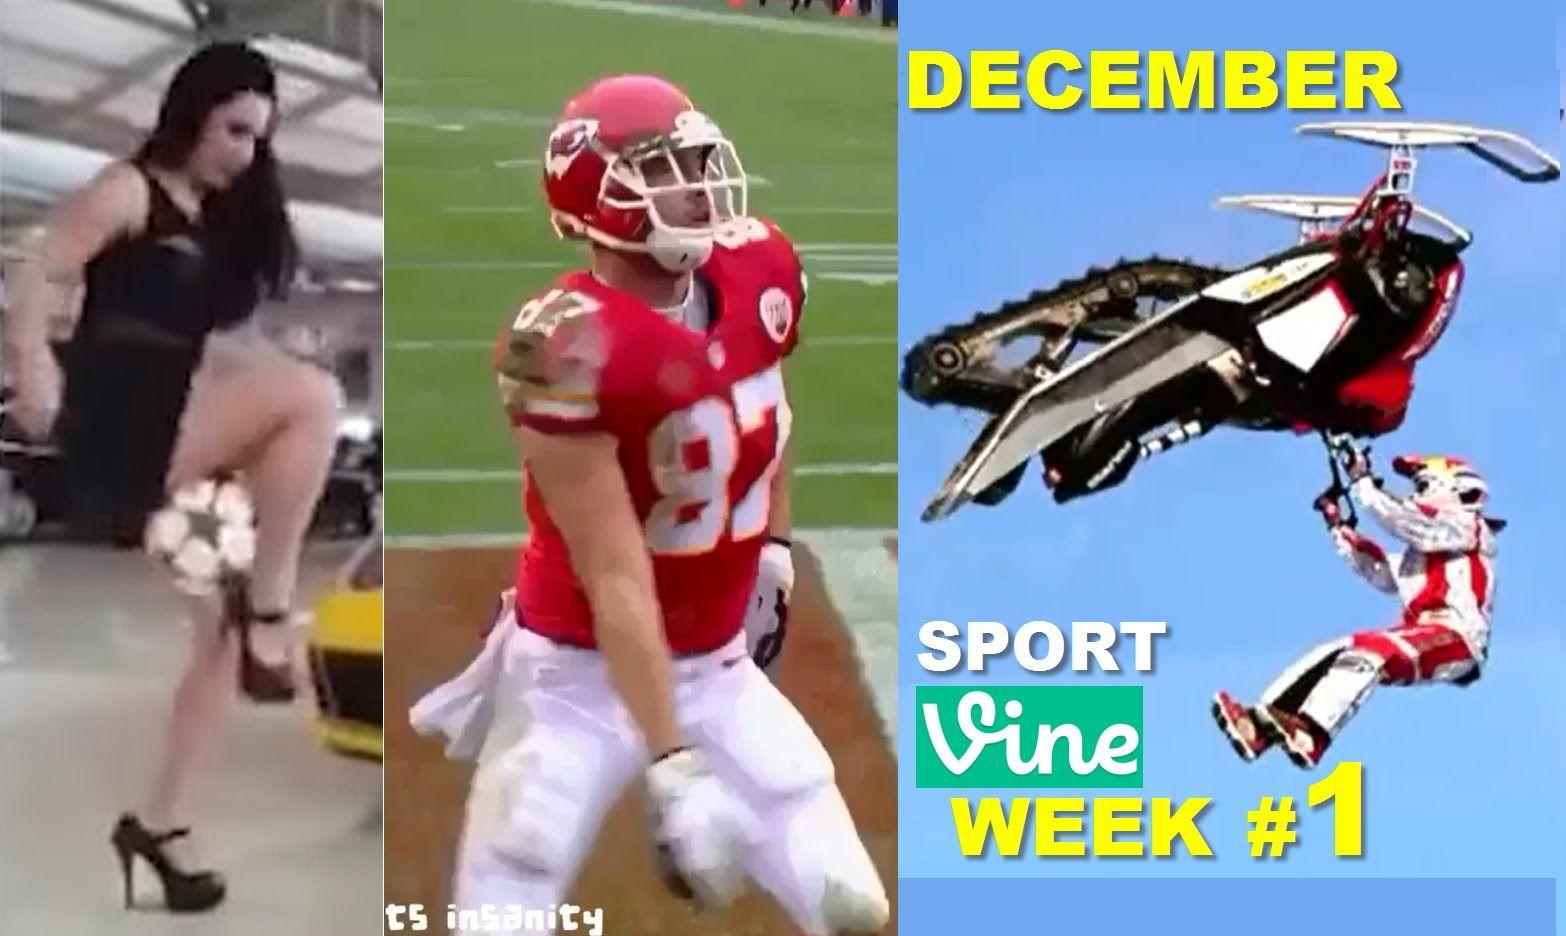 Best Sports Vines 2015 DECEMBER Week 1, Best Sports Moments Compilation